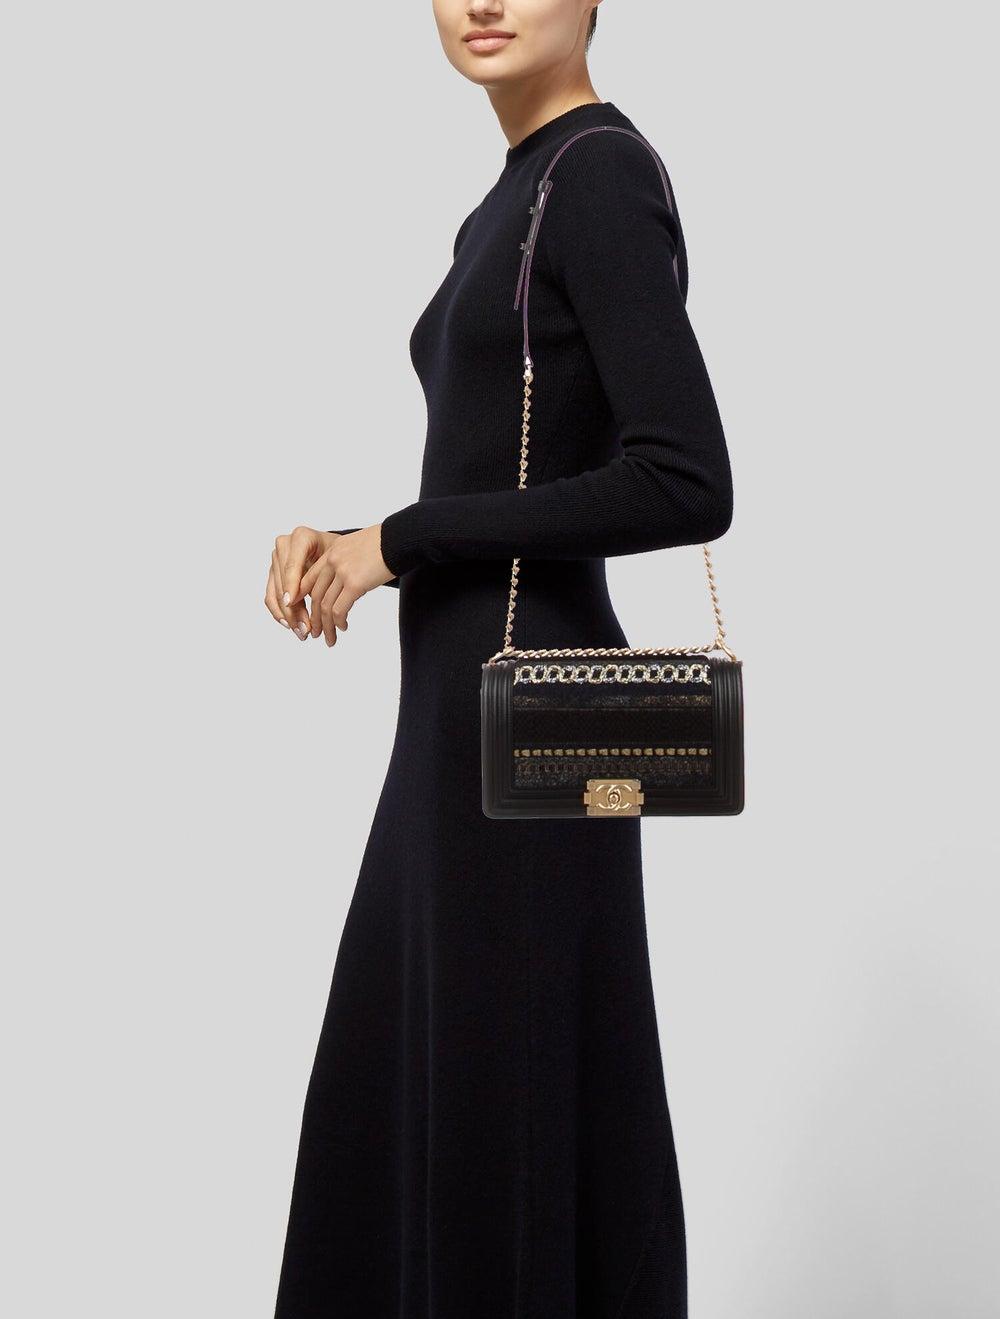 Chanel Medium Tweed Boy Bag Black - image 2